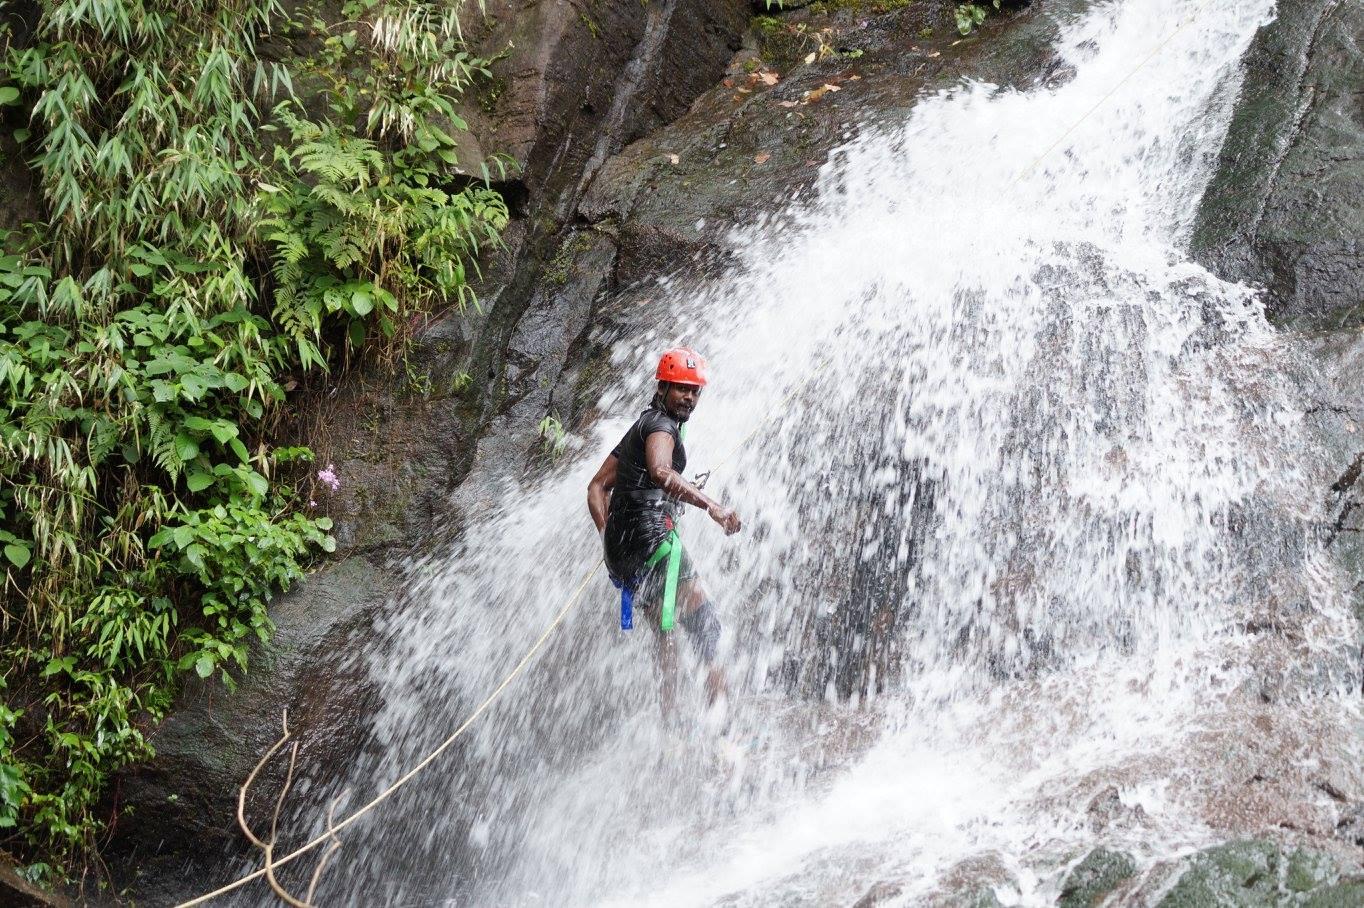 Pravin Kumar - rappelling in Dare Falls, Wayanad